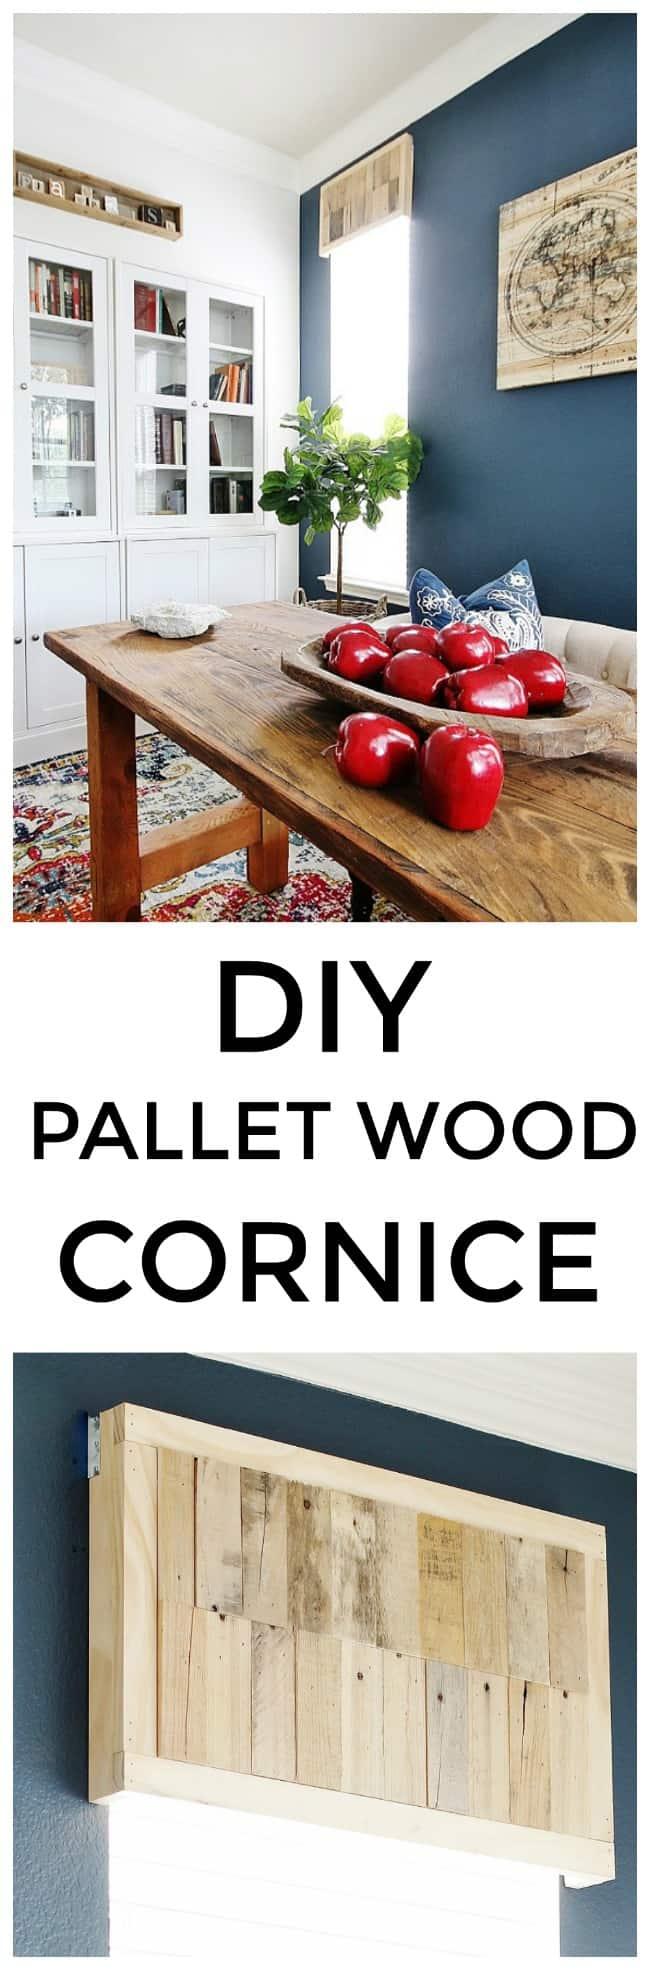 Diy Pallet Wood Cornice Board Thistlewood Farm